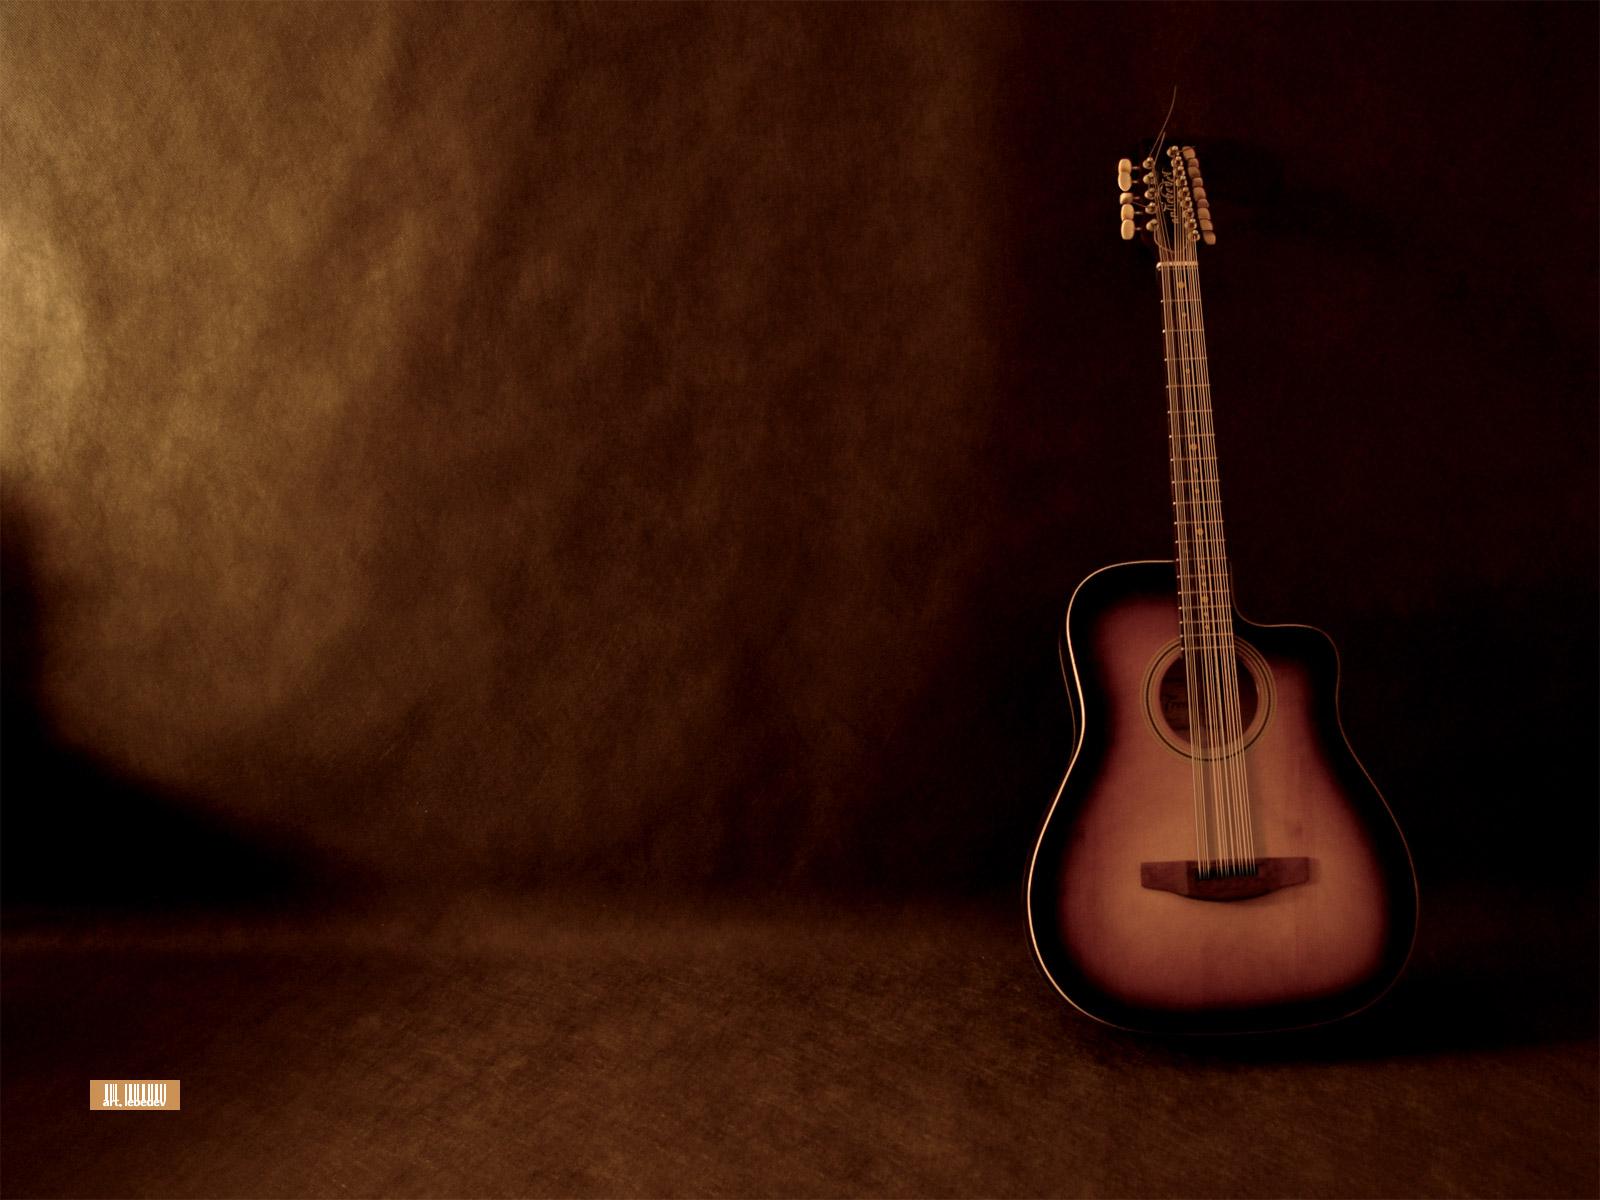 Cool Guitars Wallpaper - Cool Guitars Wallpaper